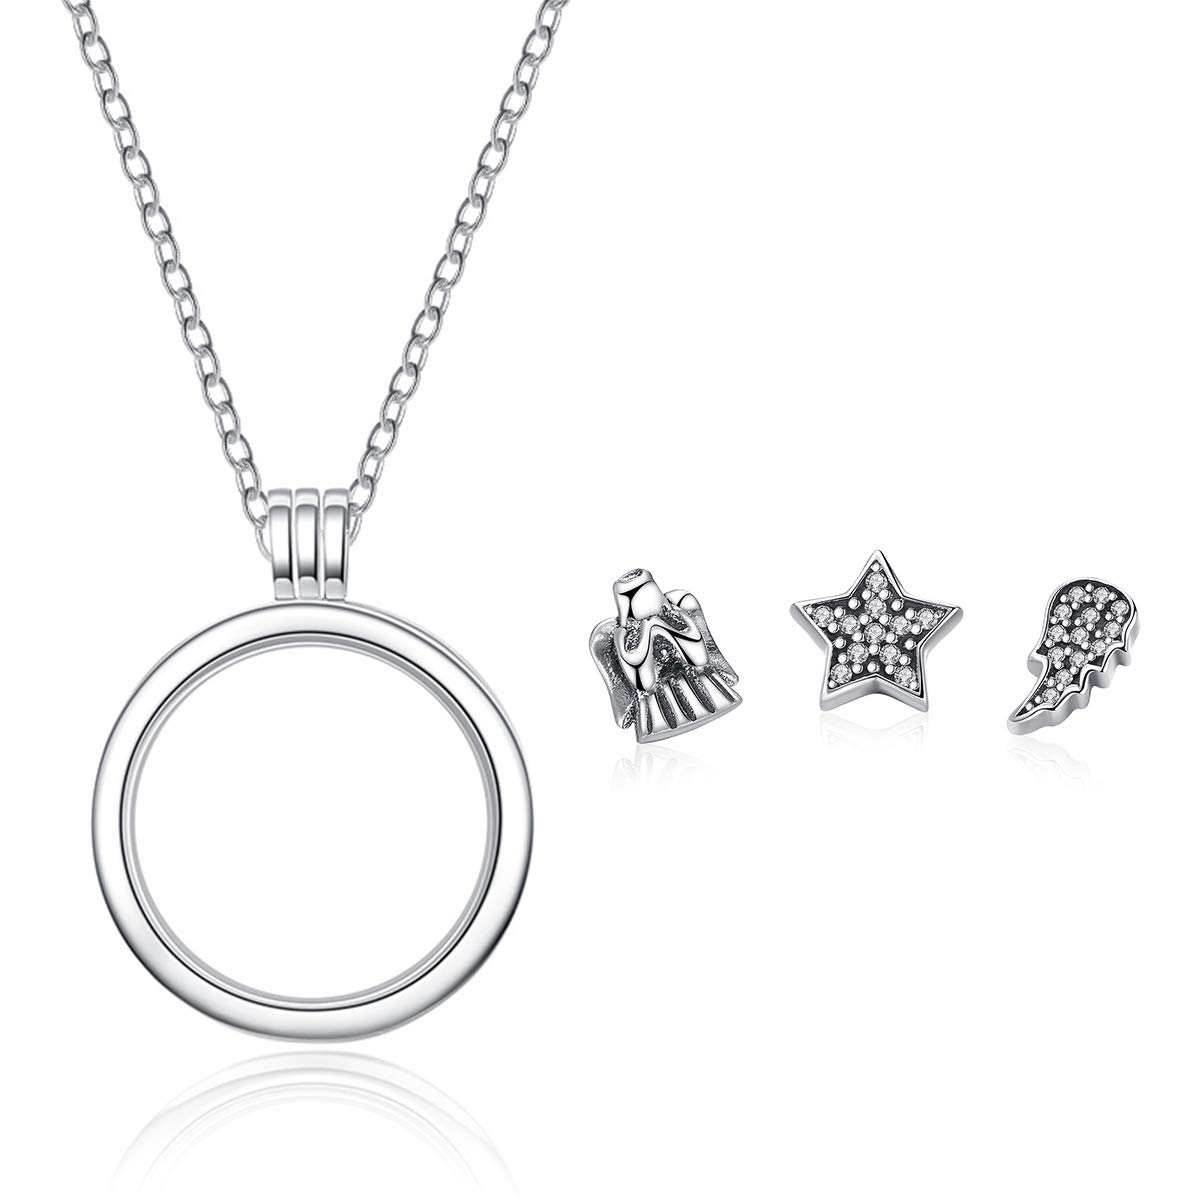 Genuine 925 Sterling Silver Medium Petite Memories Floating Locket Necklaces & Pendants Sterling Silver Jewelry